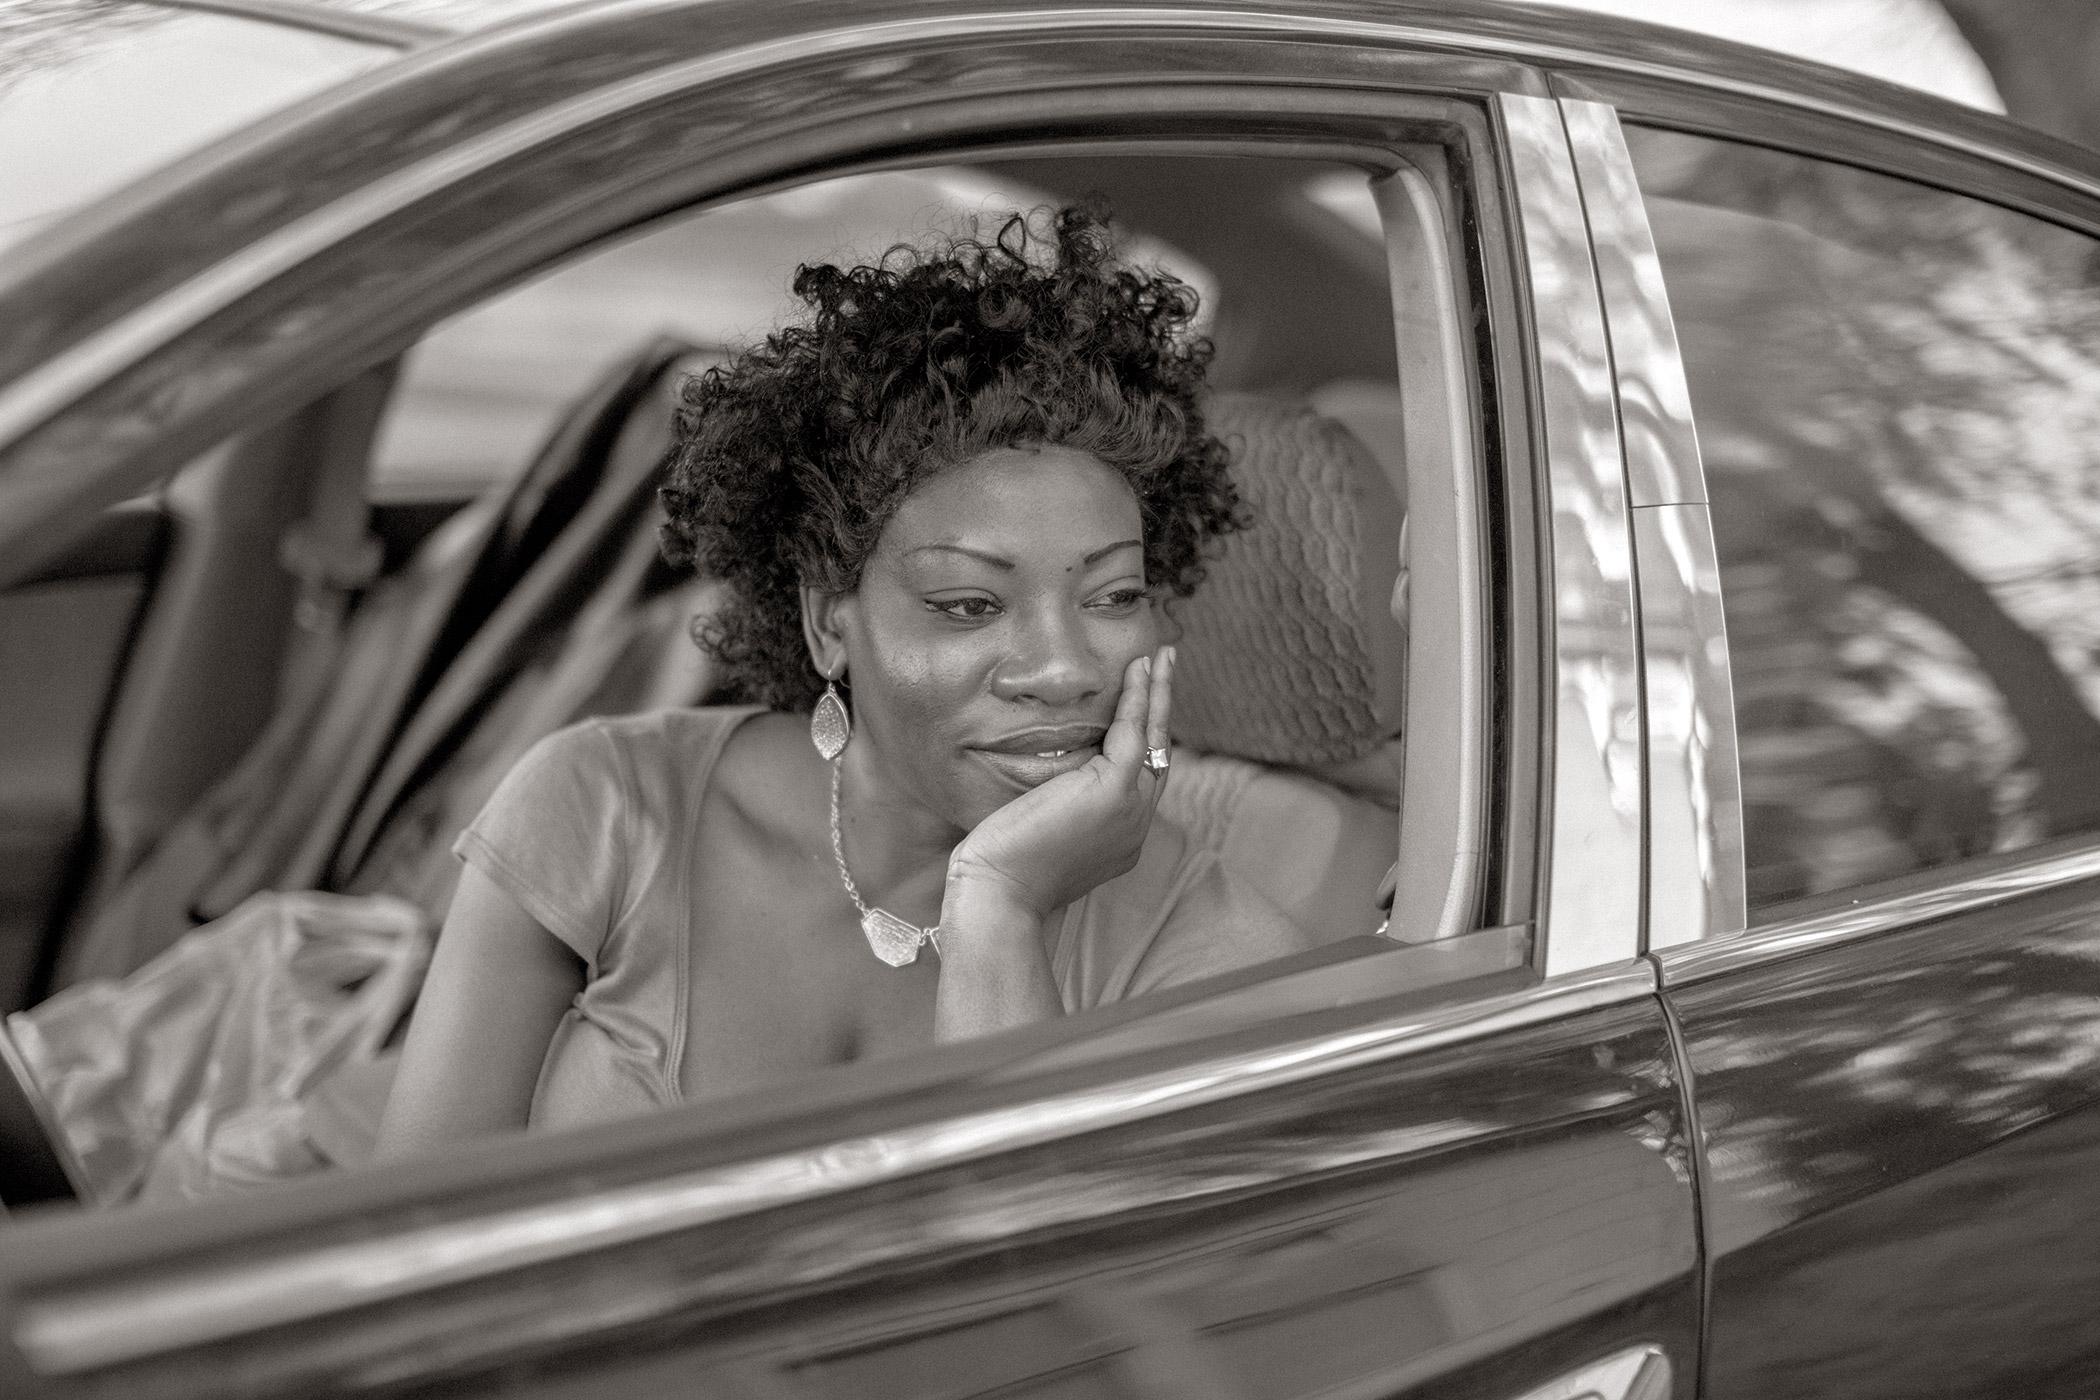 Woman Waiting for Friend, Pinetta, FL